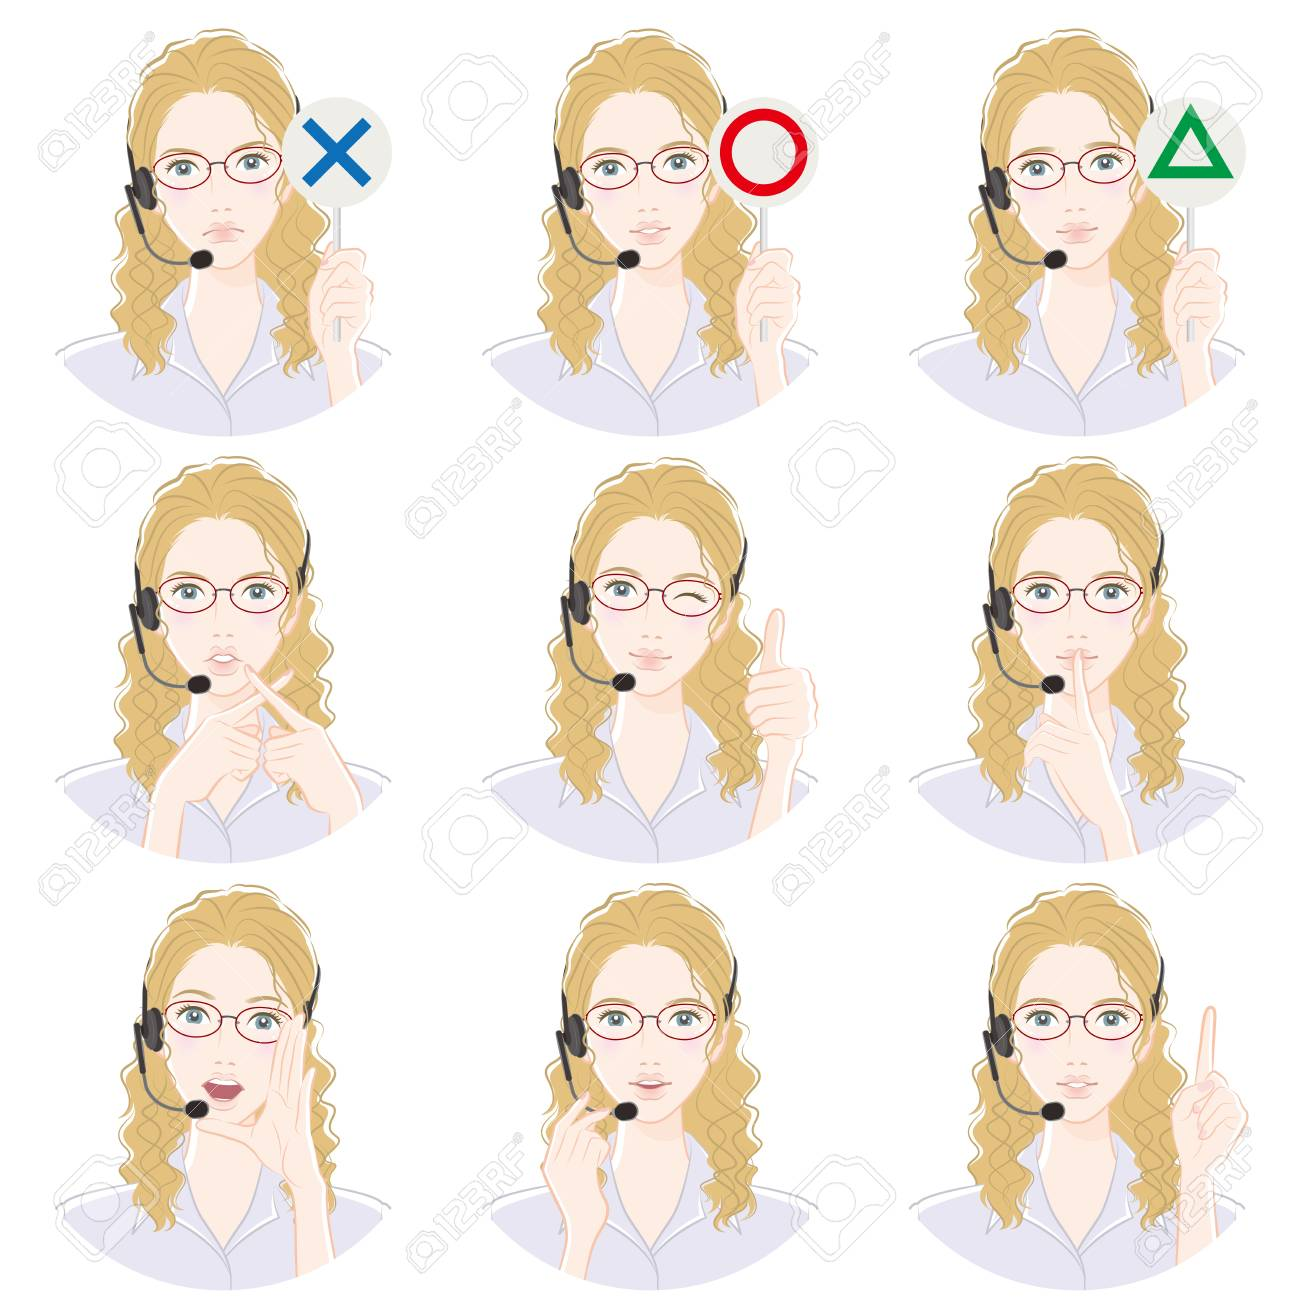 Various facial expressions of English teachers - 117196771